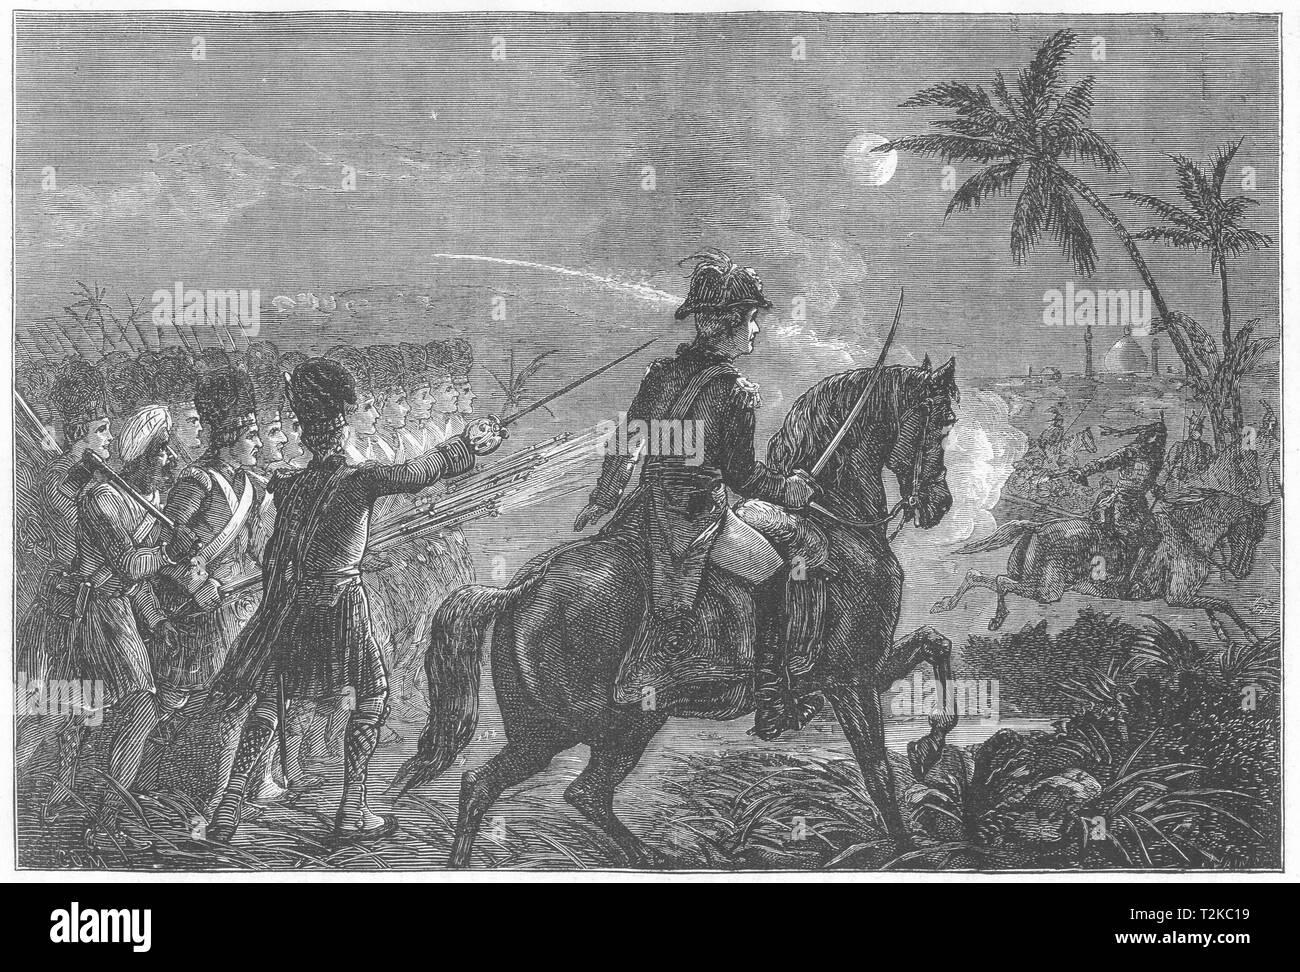 INDIA. Charge of the Highlanders at Srirangapatna c1880 old antique print - Stock Image